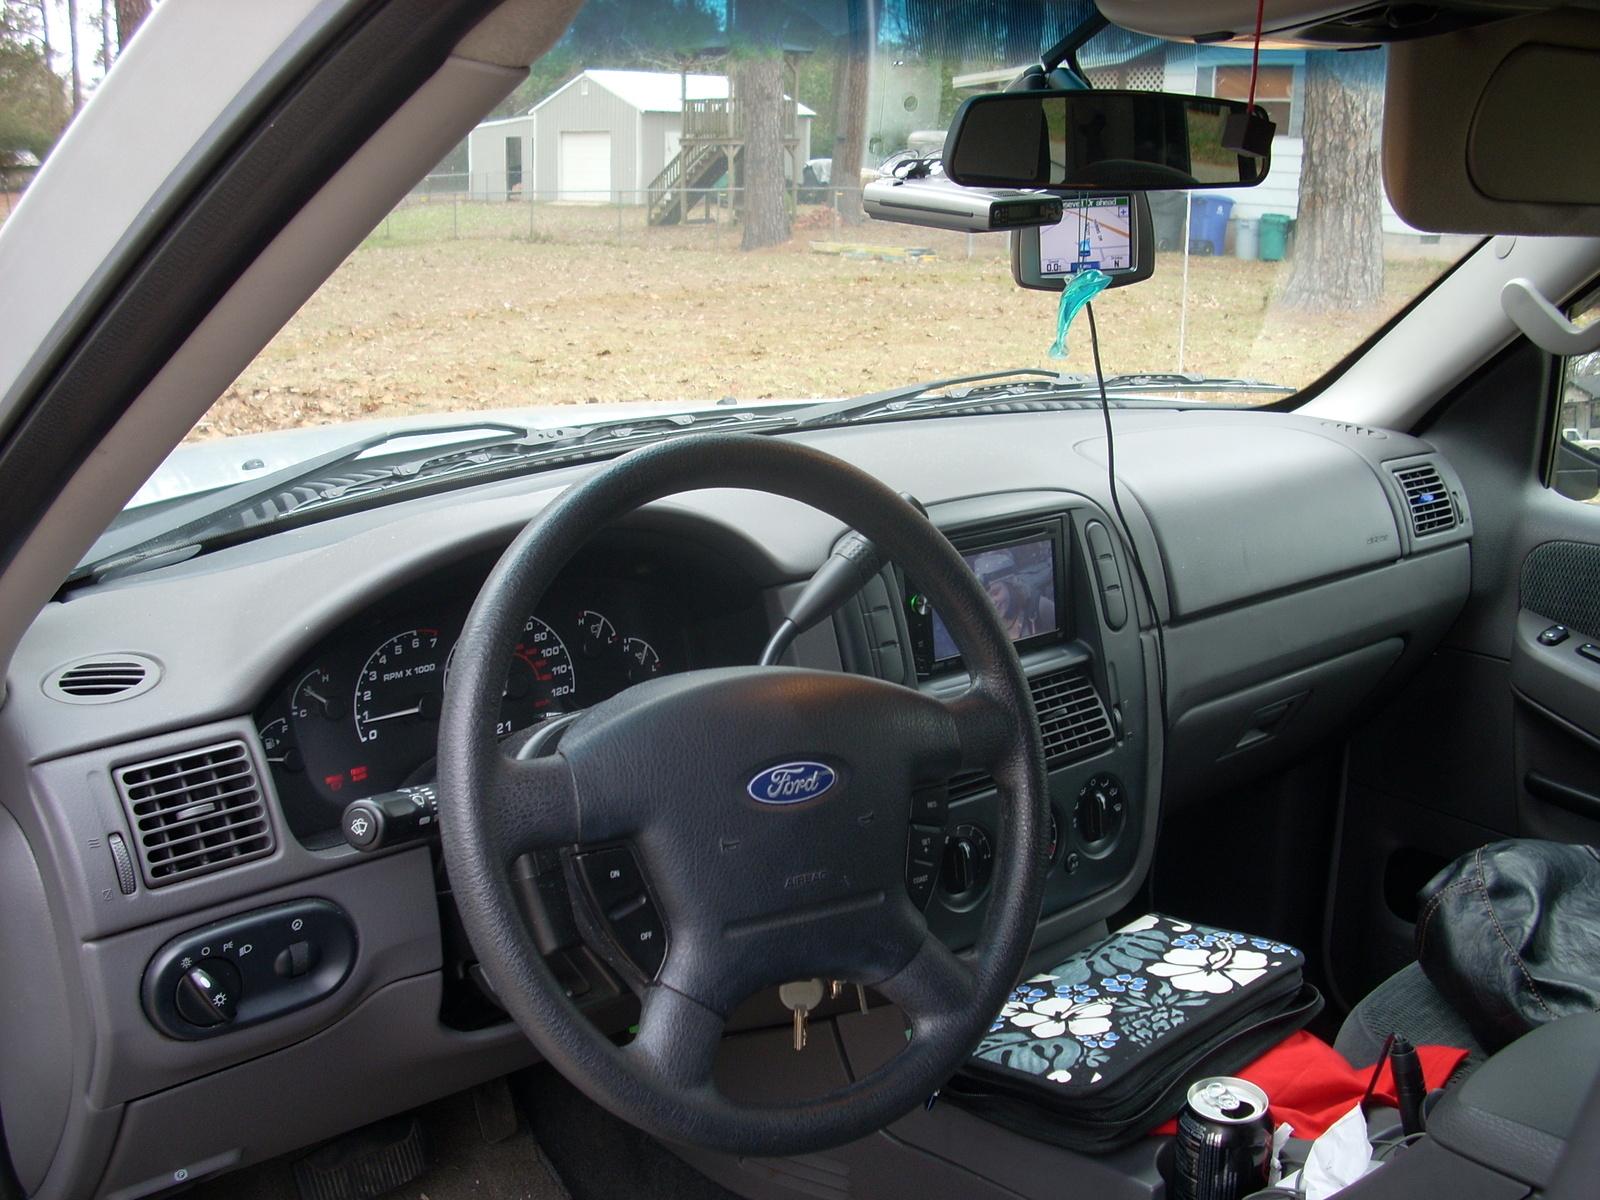 2004 F 150 Interior Lights Stay On